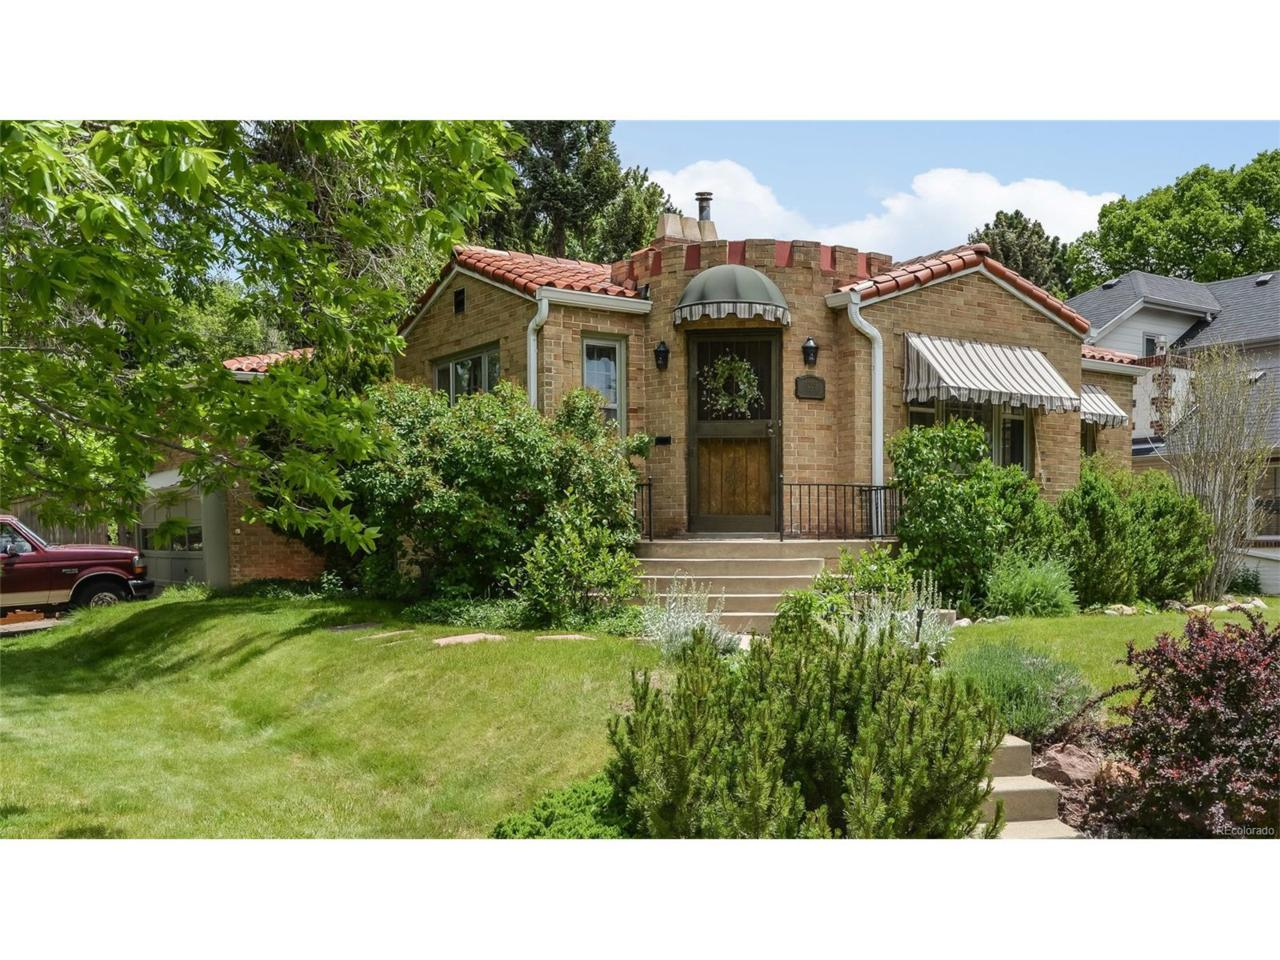 1058 Newport Street, Denver, CO 80220 (MLS #5589064) :: 8z Real Estate